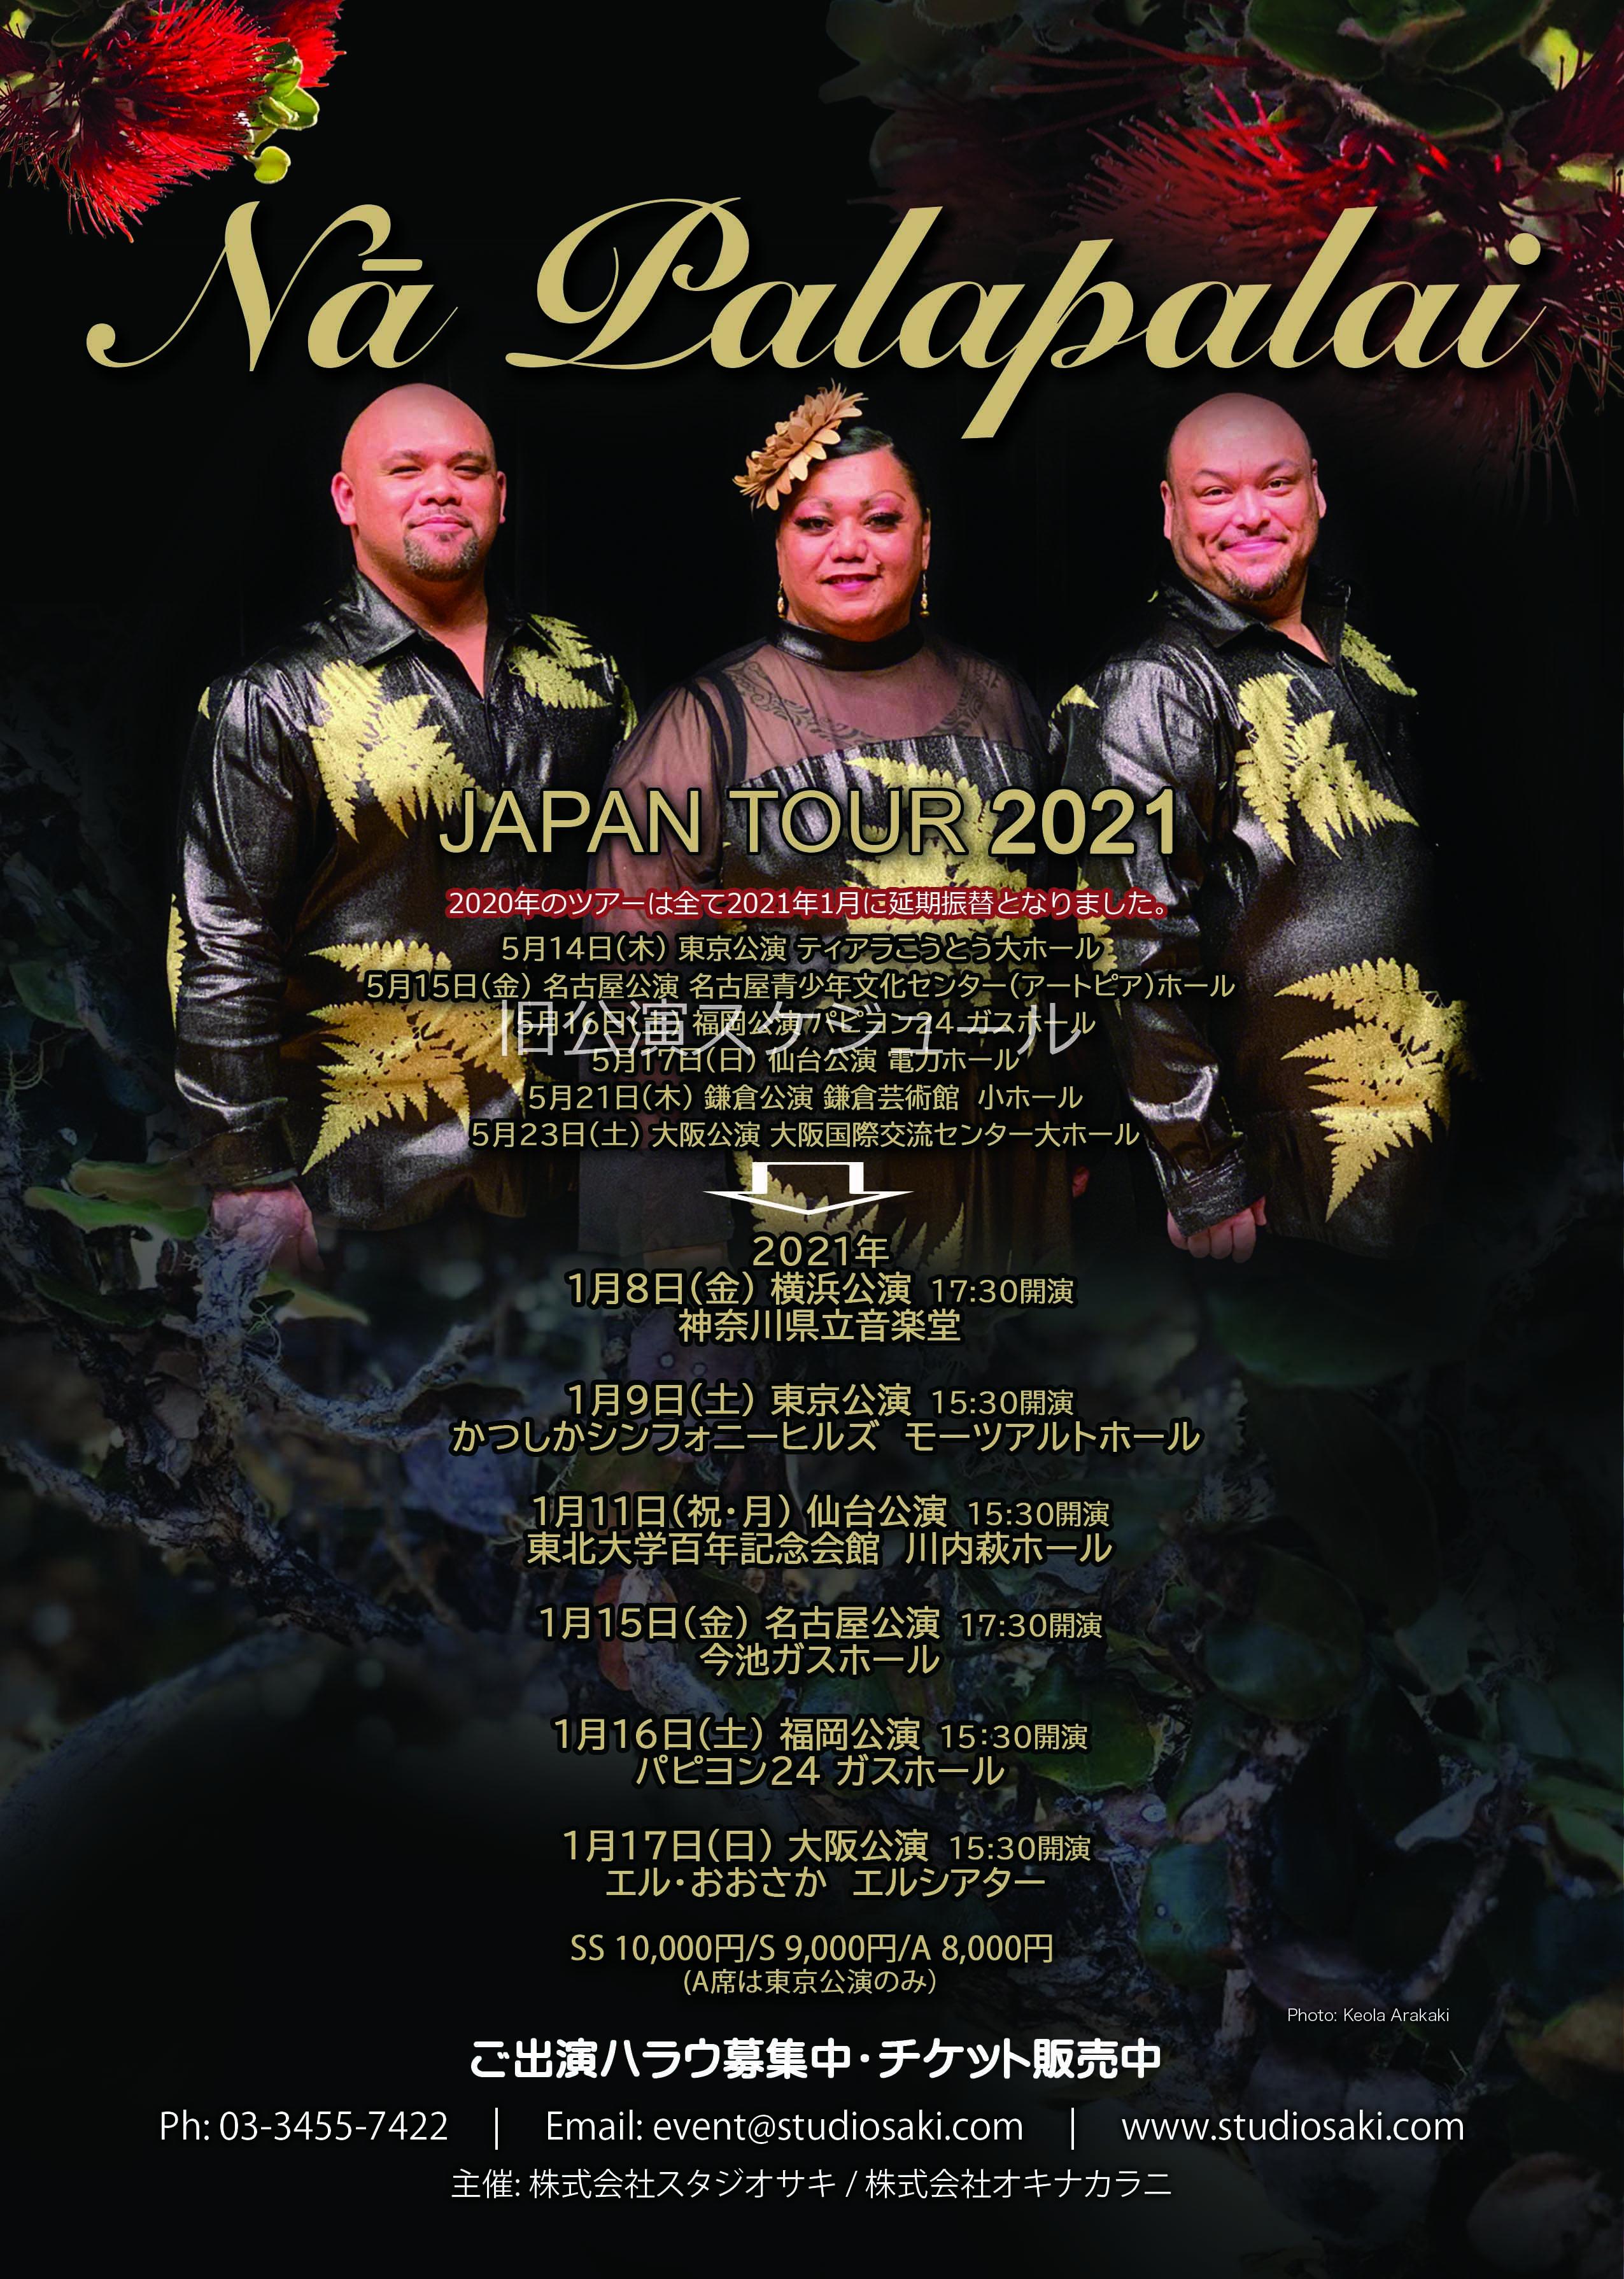 Na Palapalai Japan Tour 2020 公演内容再変更のお知らせ